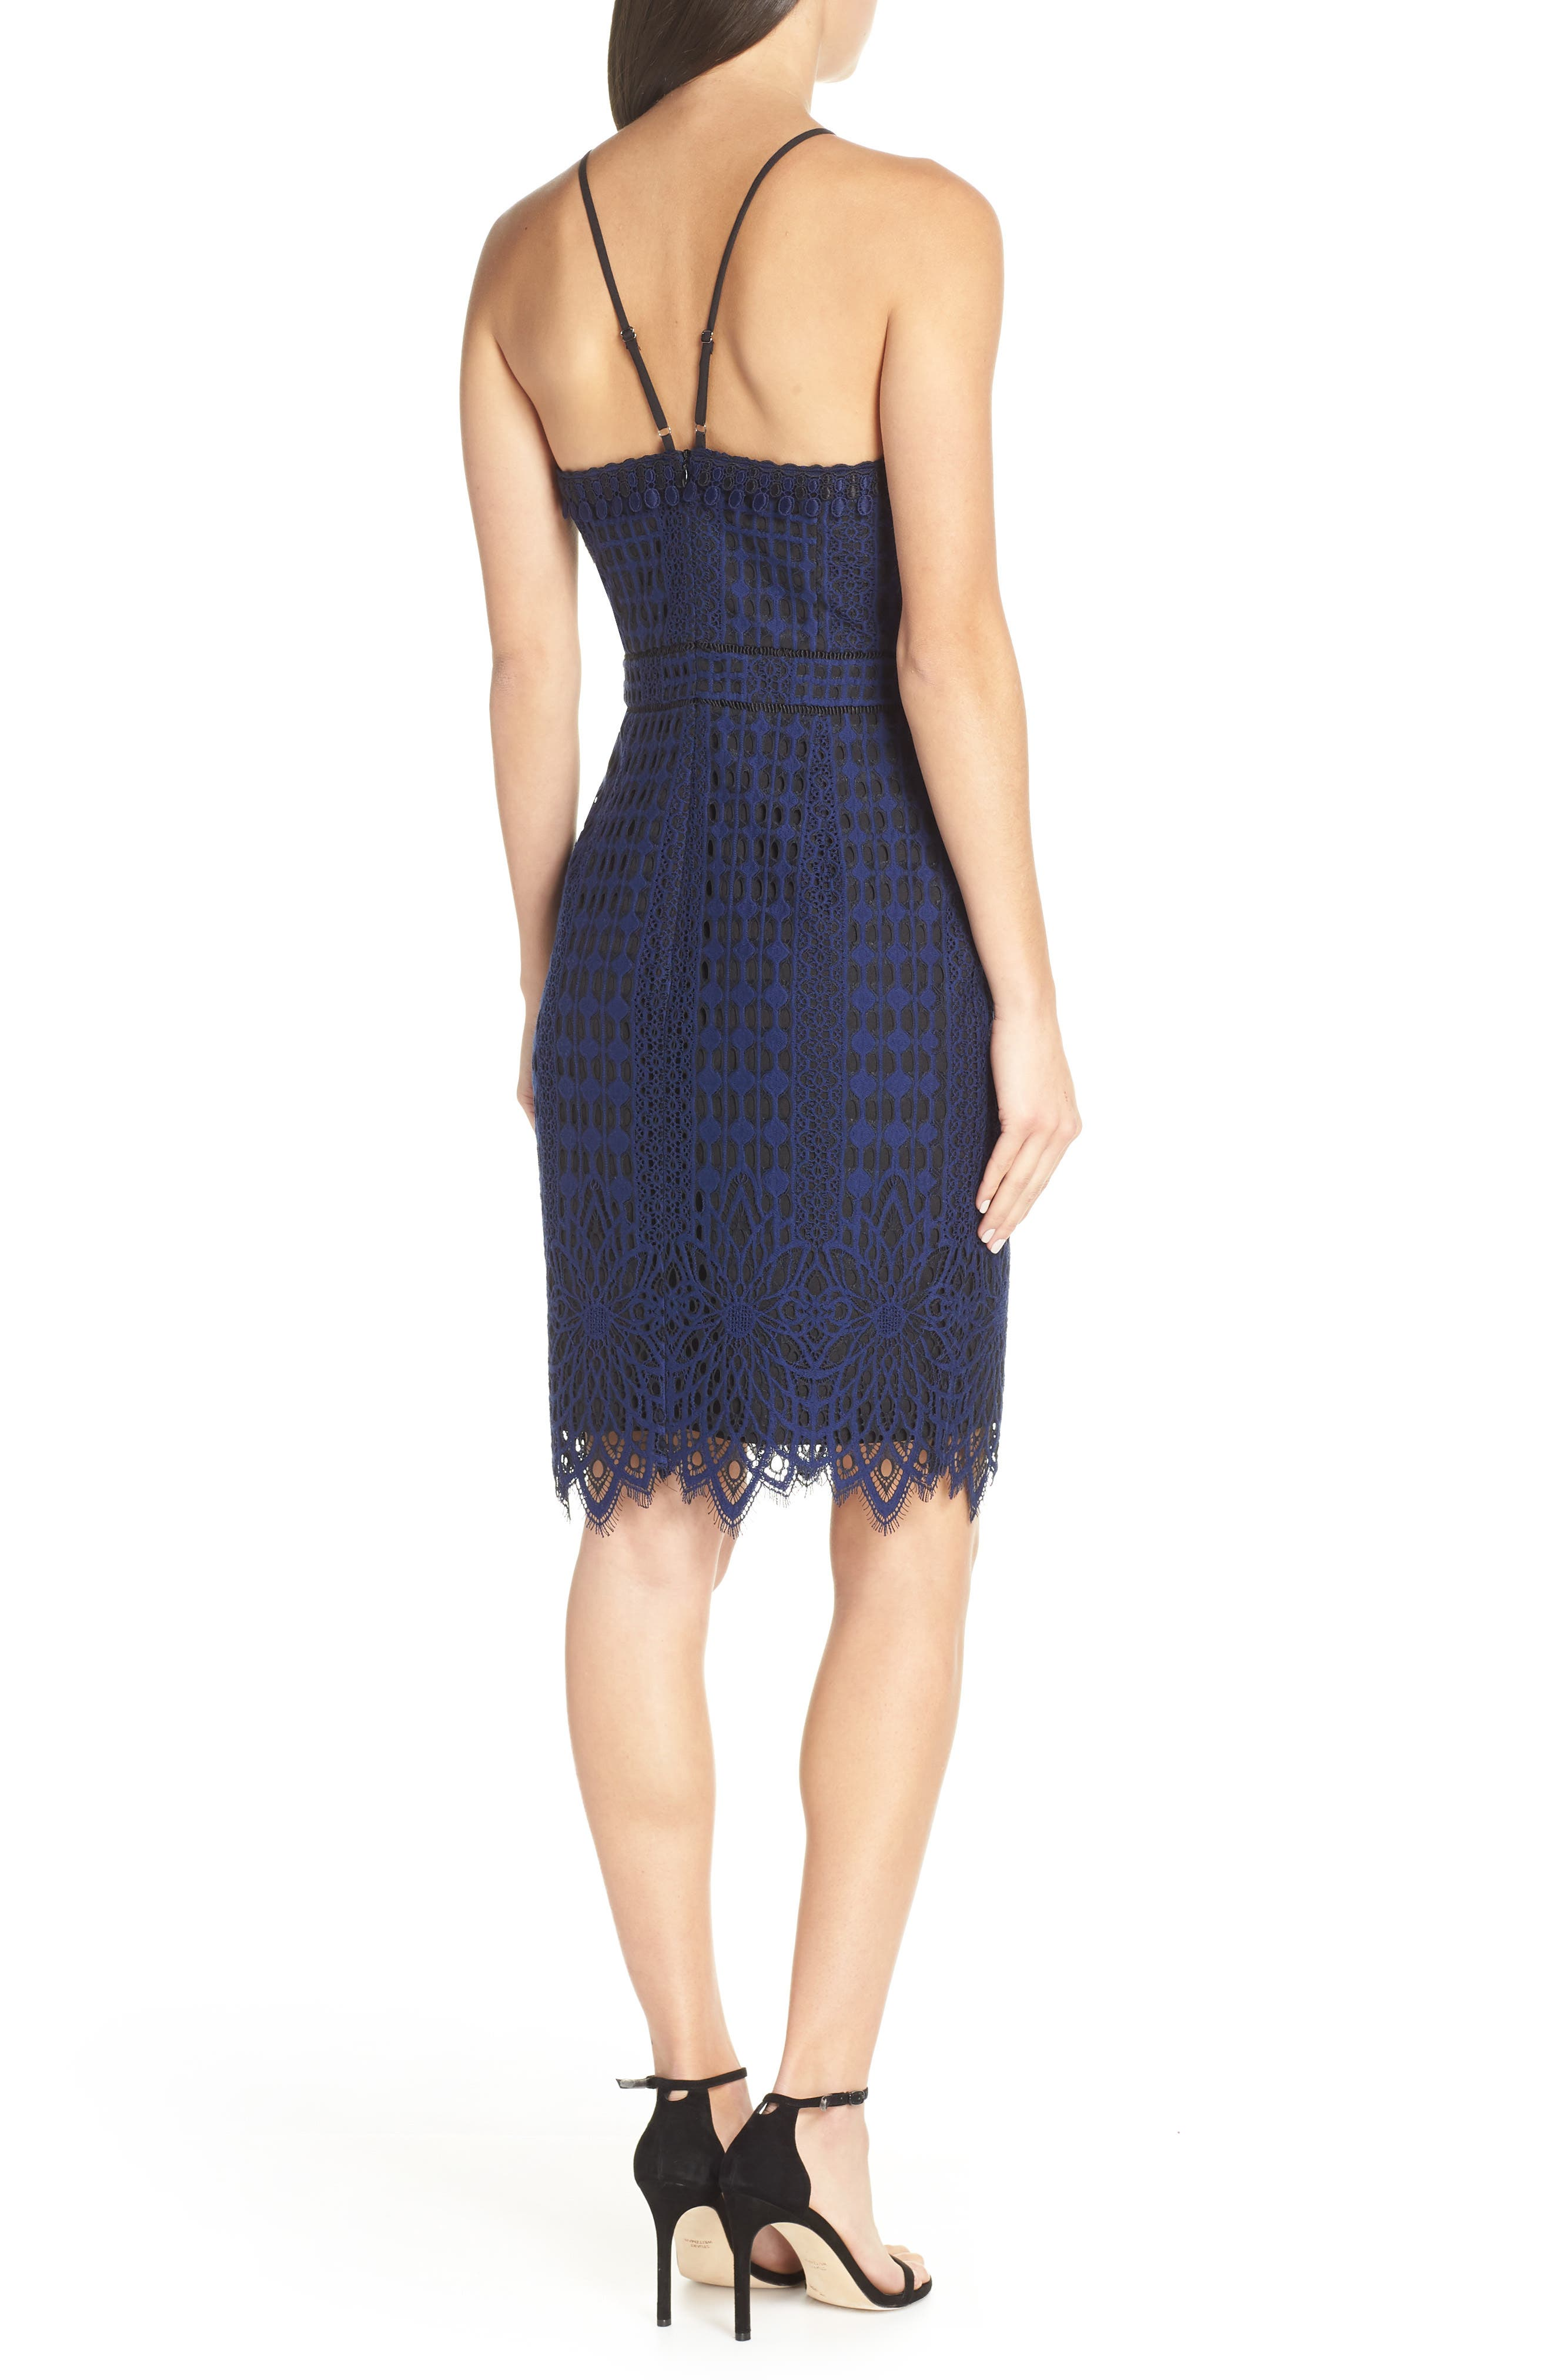 HARLYN,                             Contrast Chiffon Lace Halter Body-Con Dress,                             Alternate thumbnail 2, color,                             NAVY